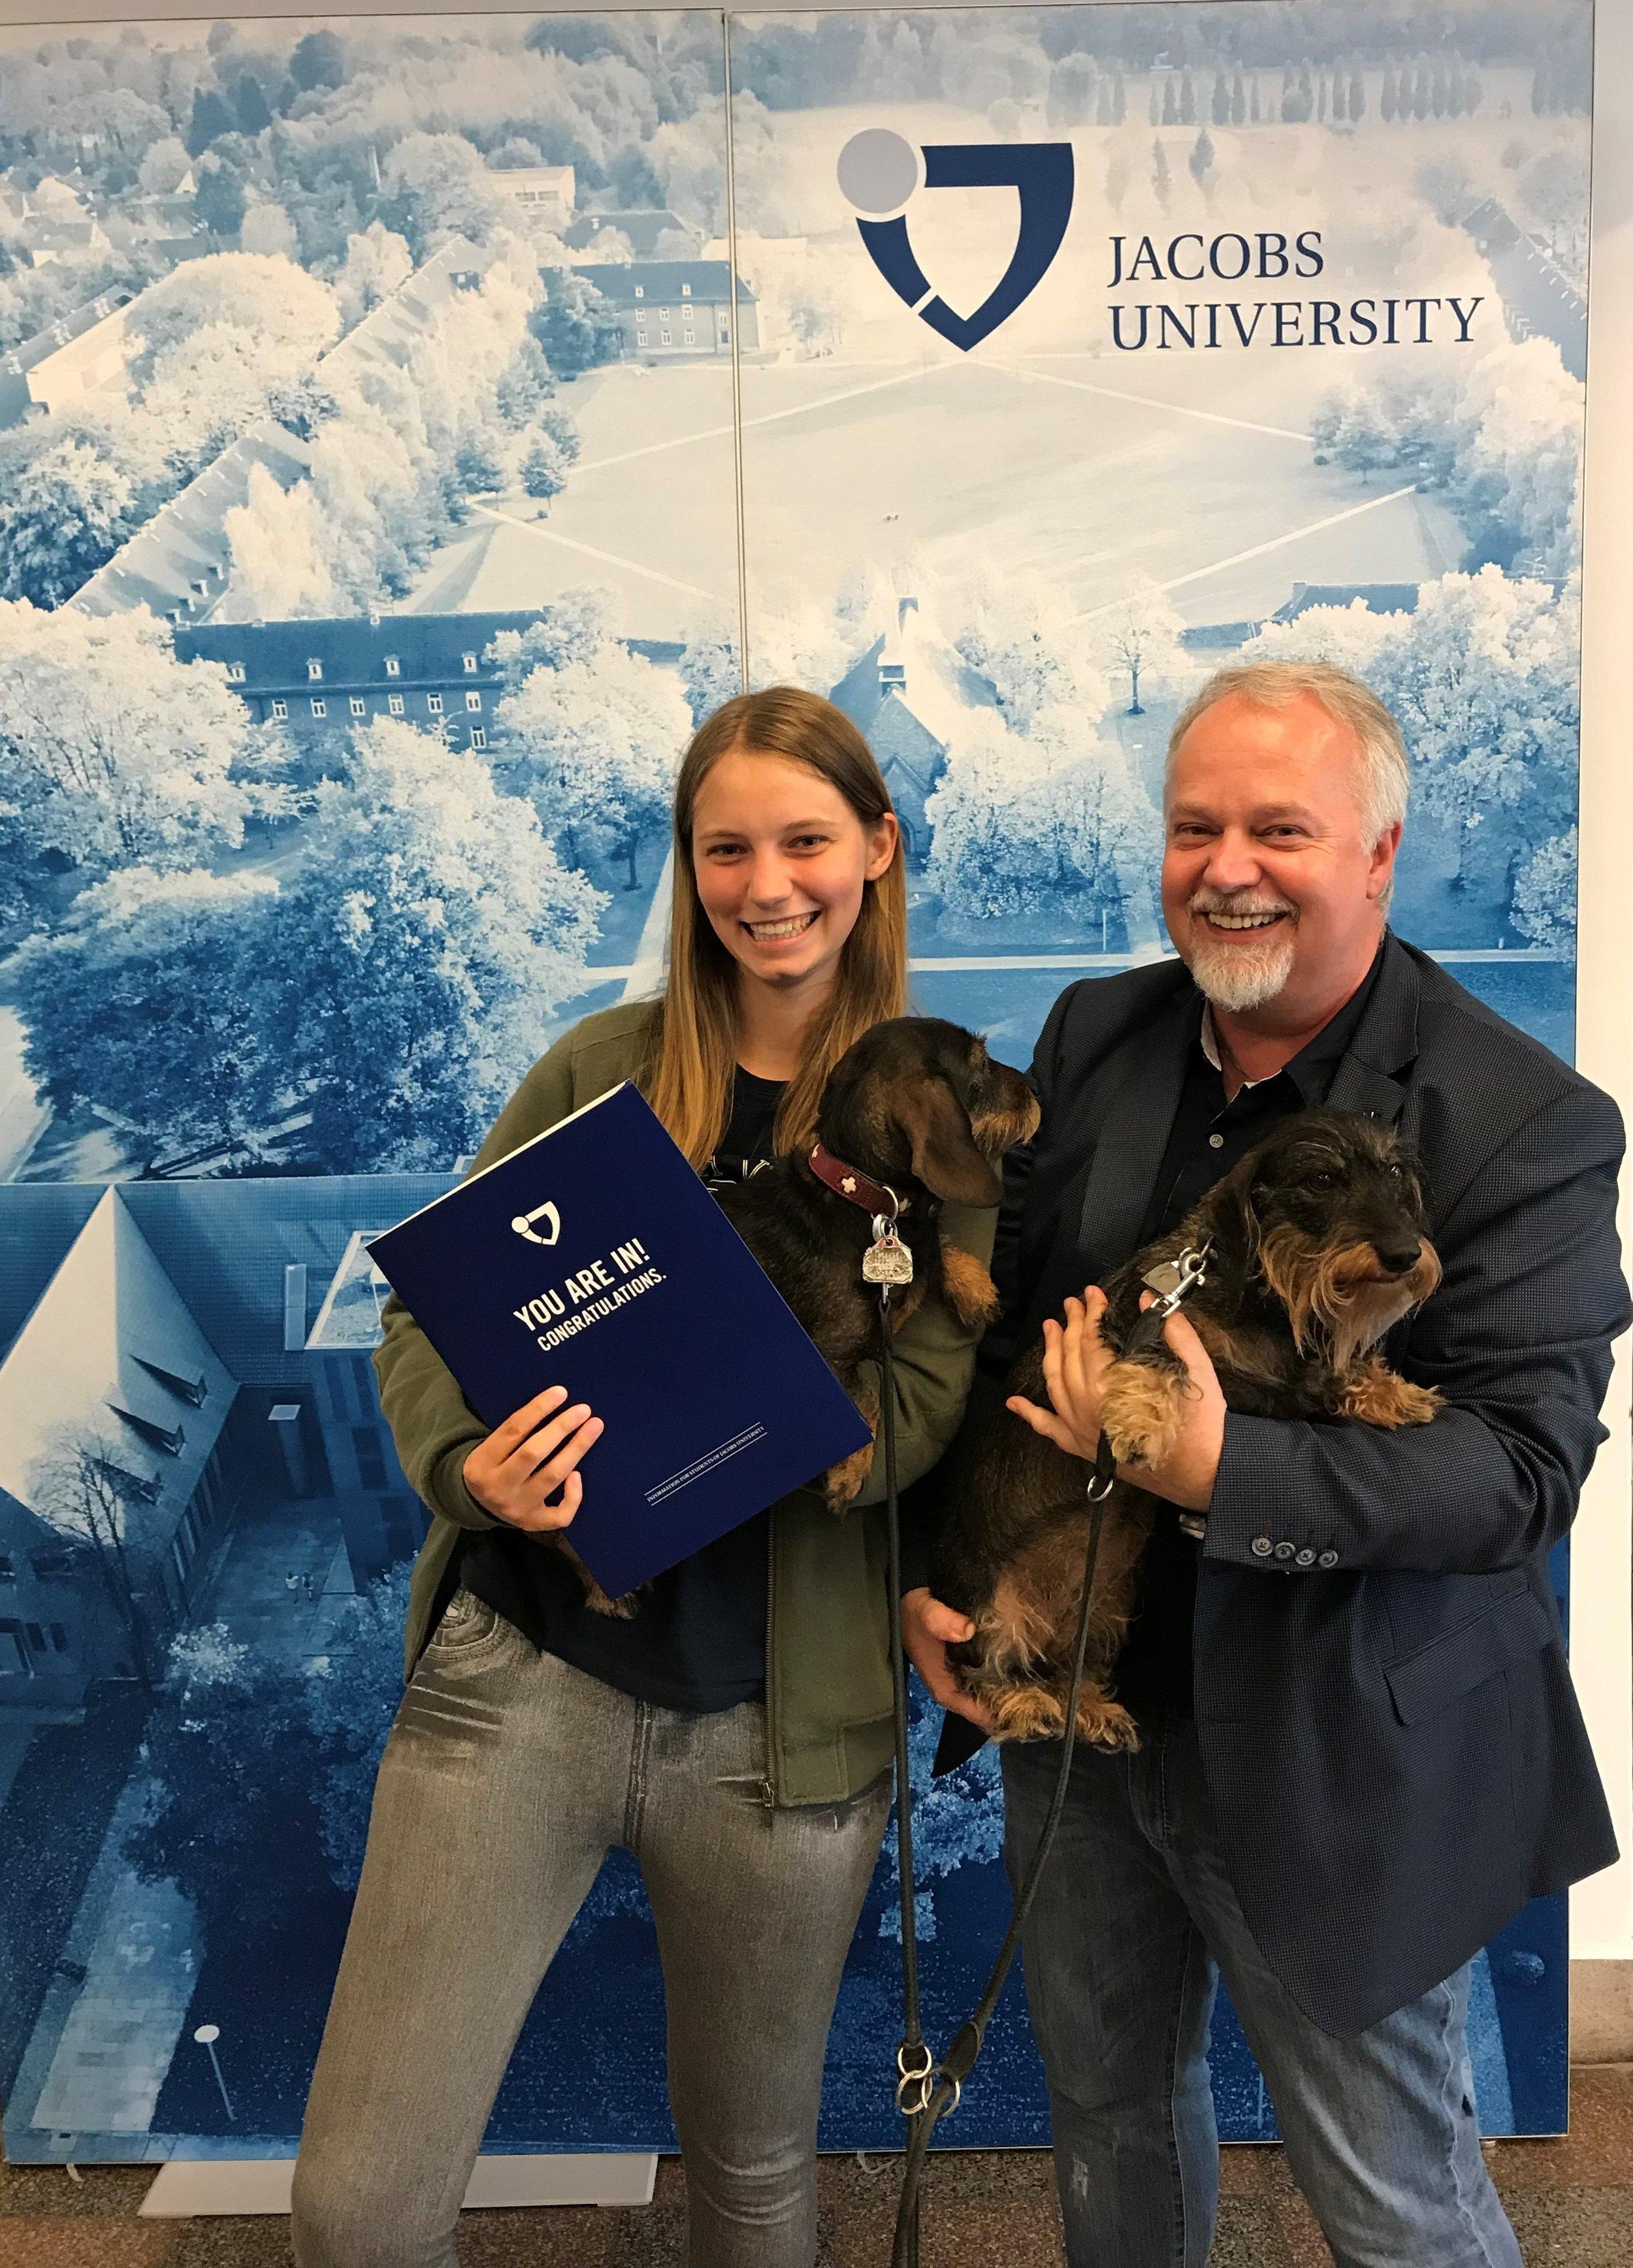 Dean Arvid Kappas, Zulassungstag 2019 participant and pets